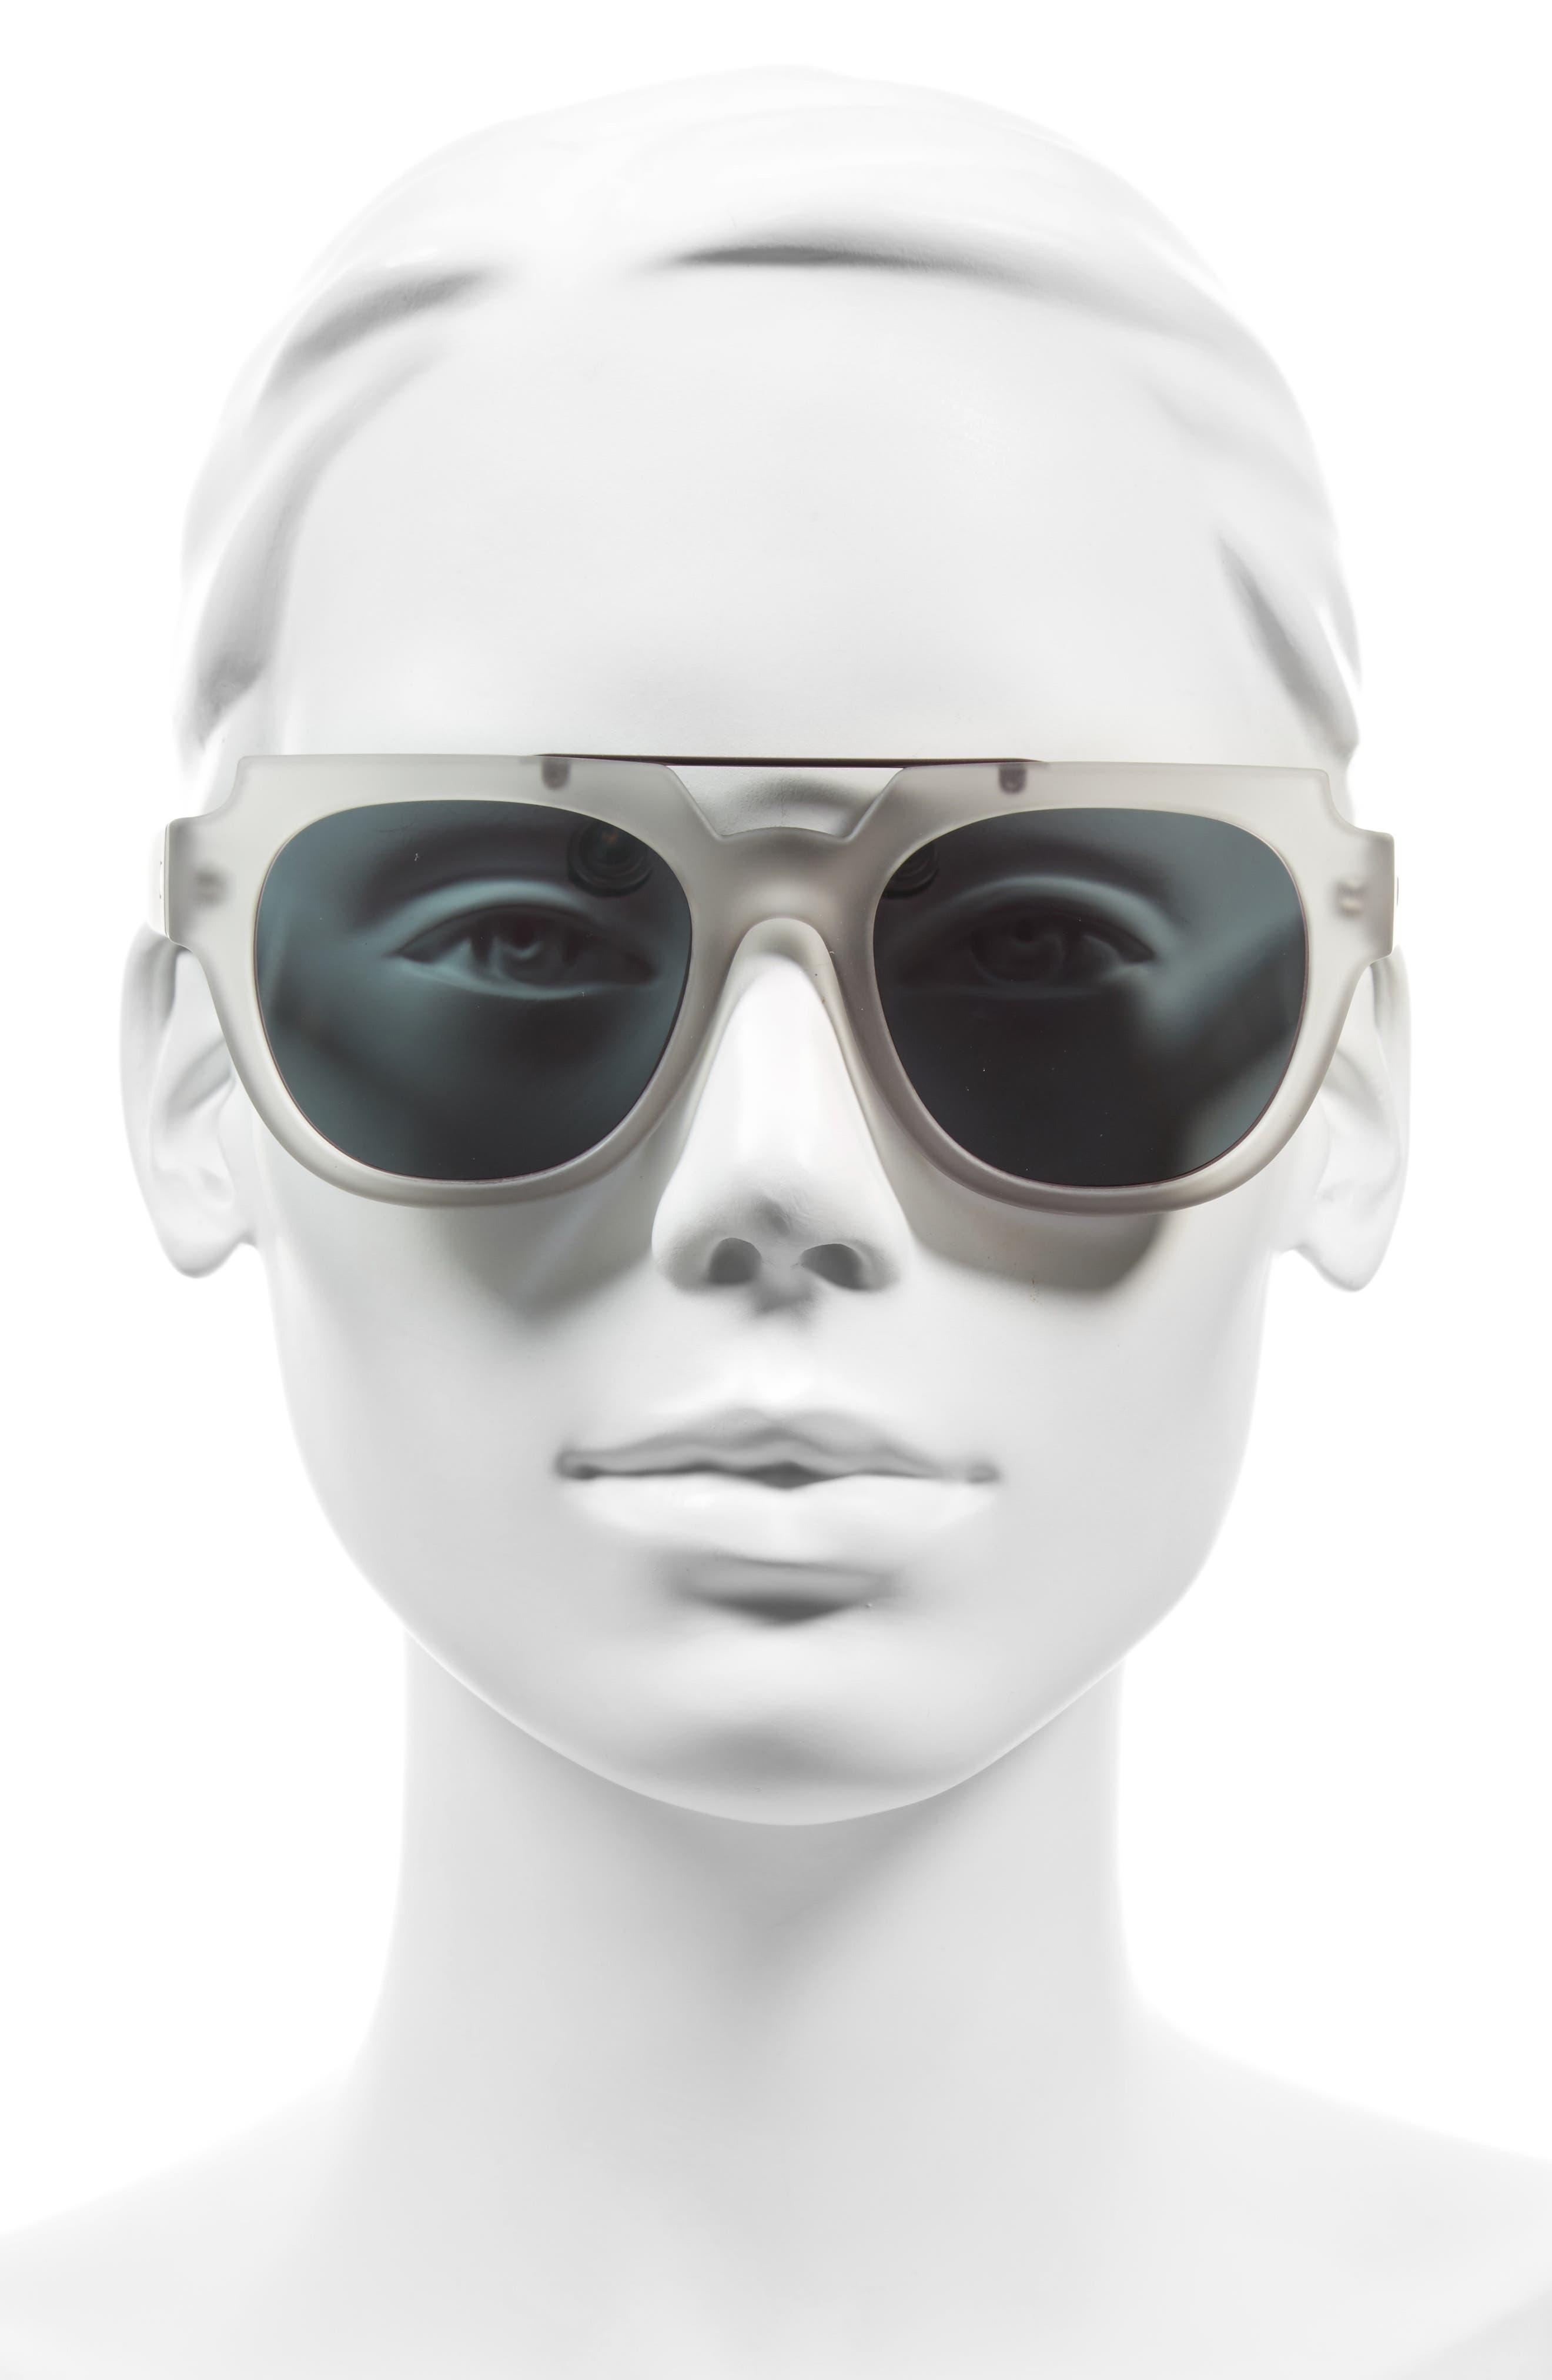 La Habana 52mm Retro Sunglasses,                             Alternate thumbnail 2, color,                             Matte Mist